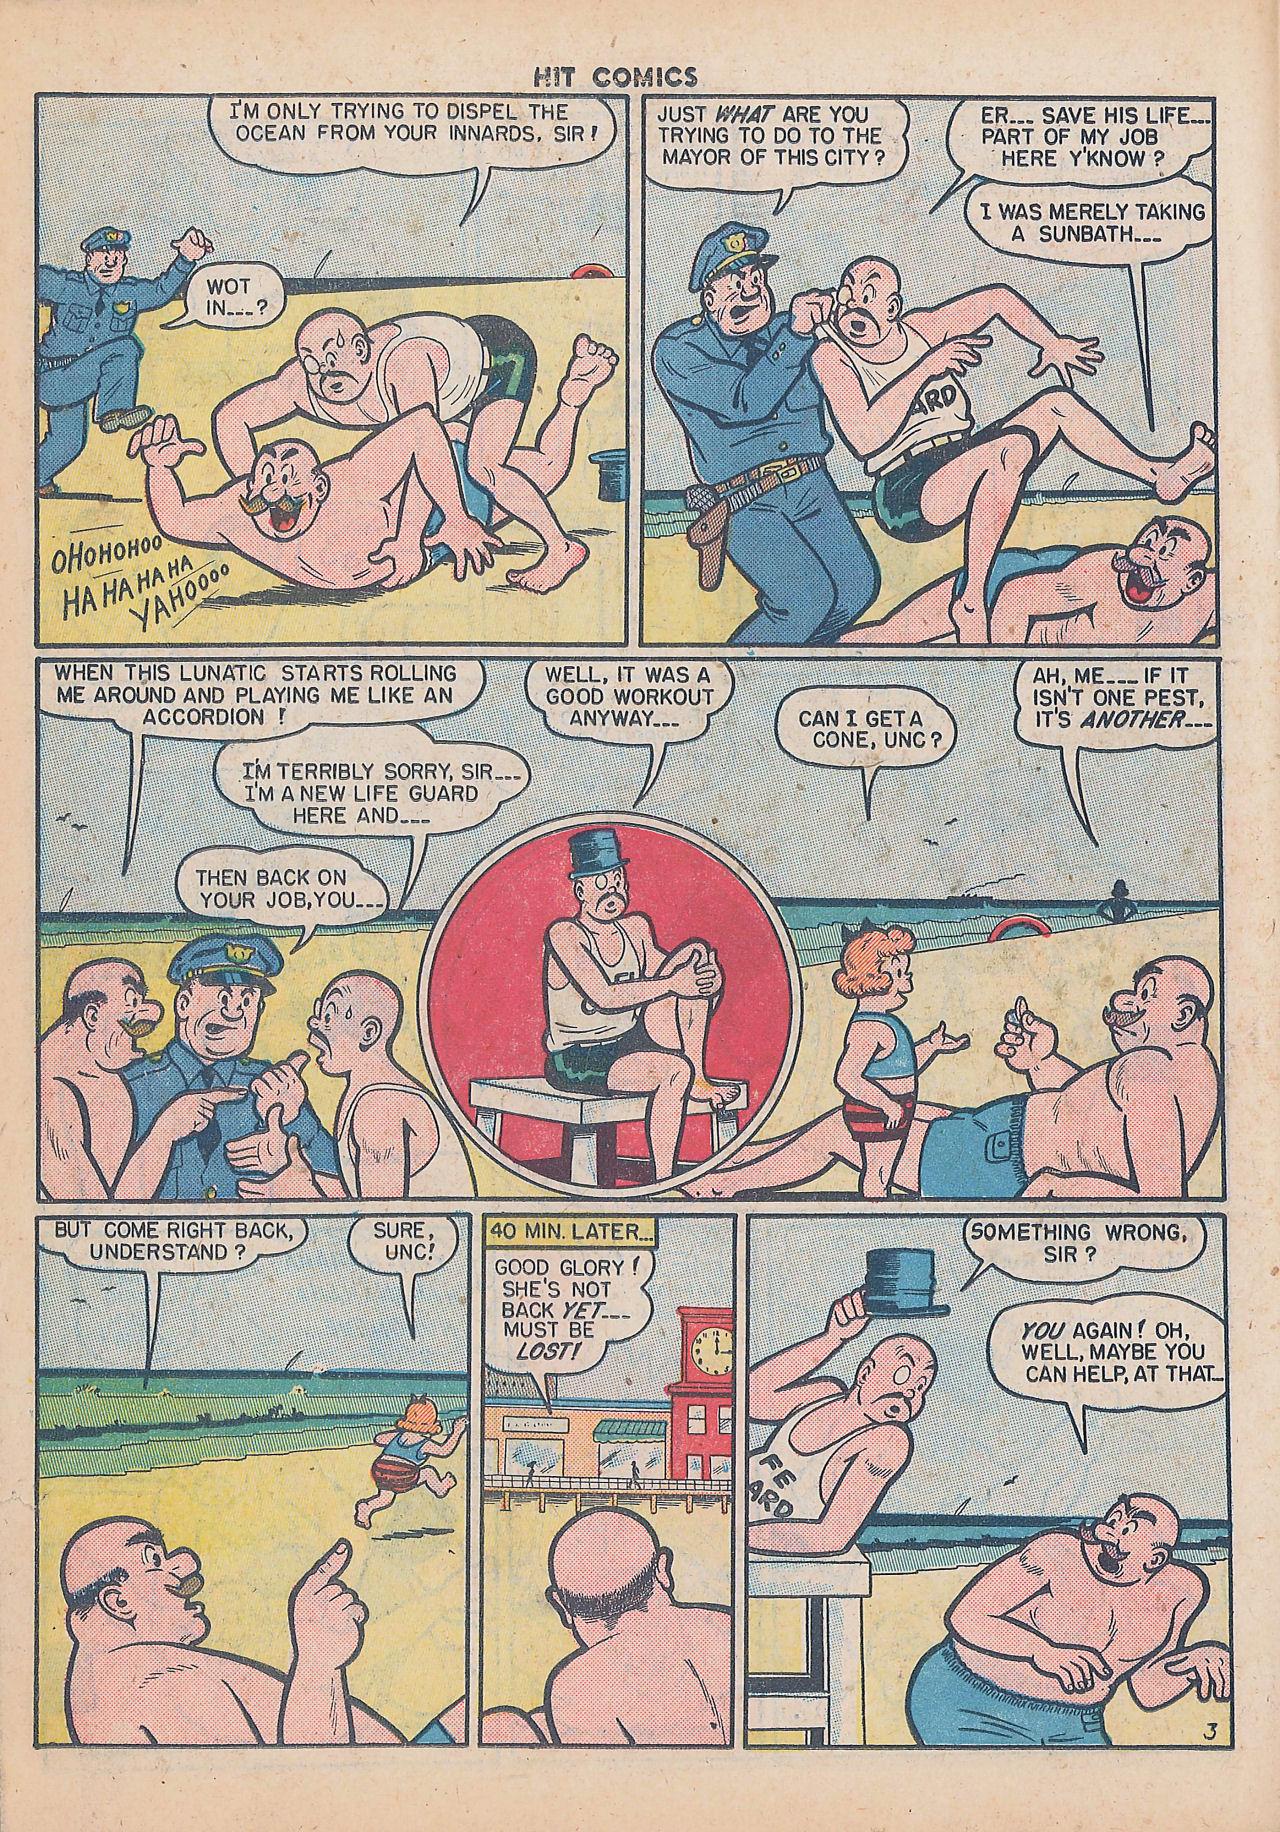 Read online Hit Comics comic -  Issue #64 - 18